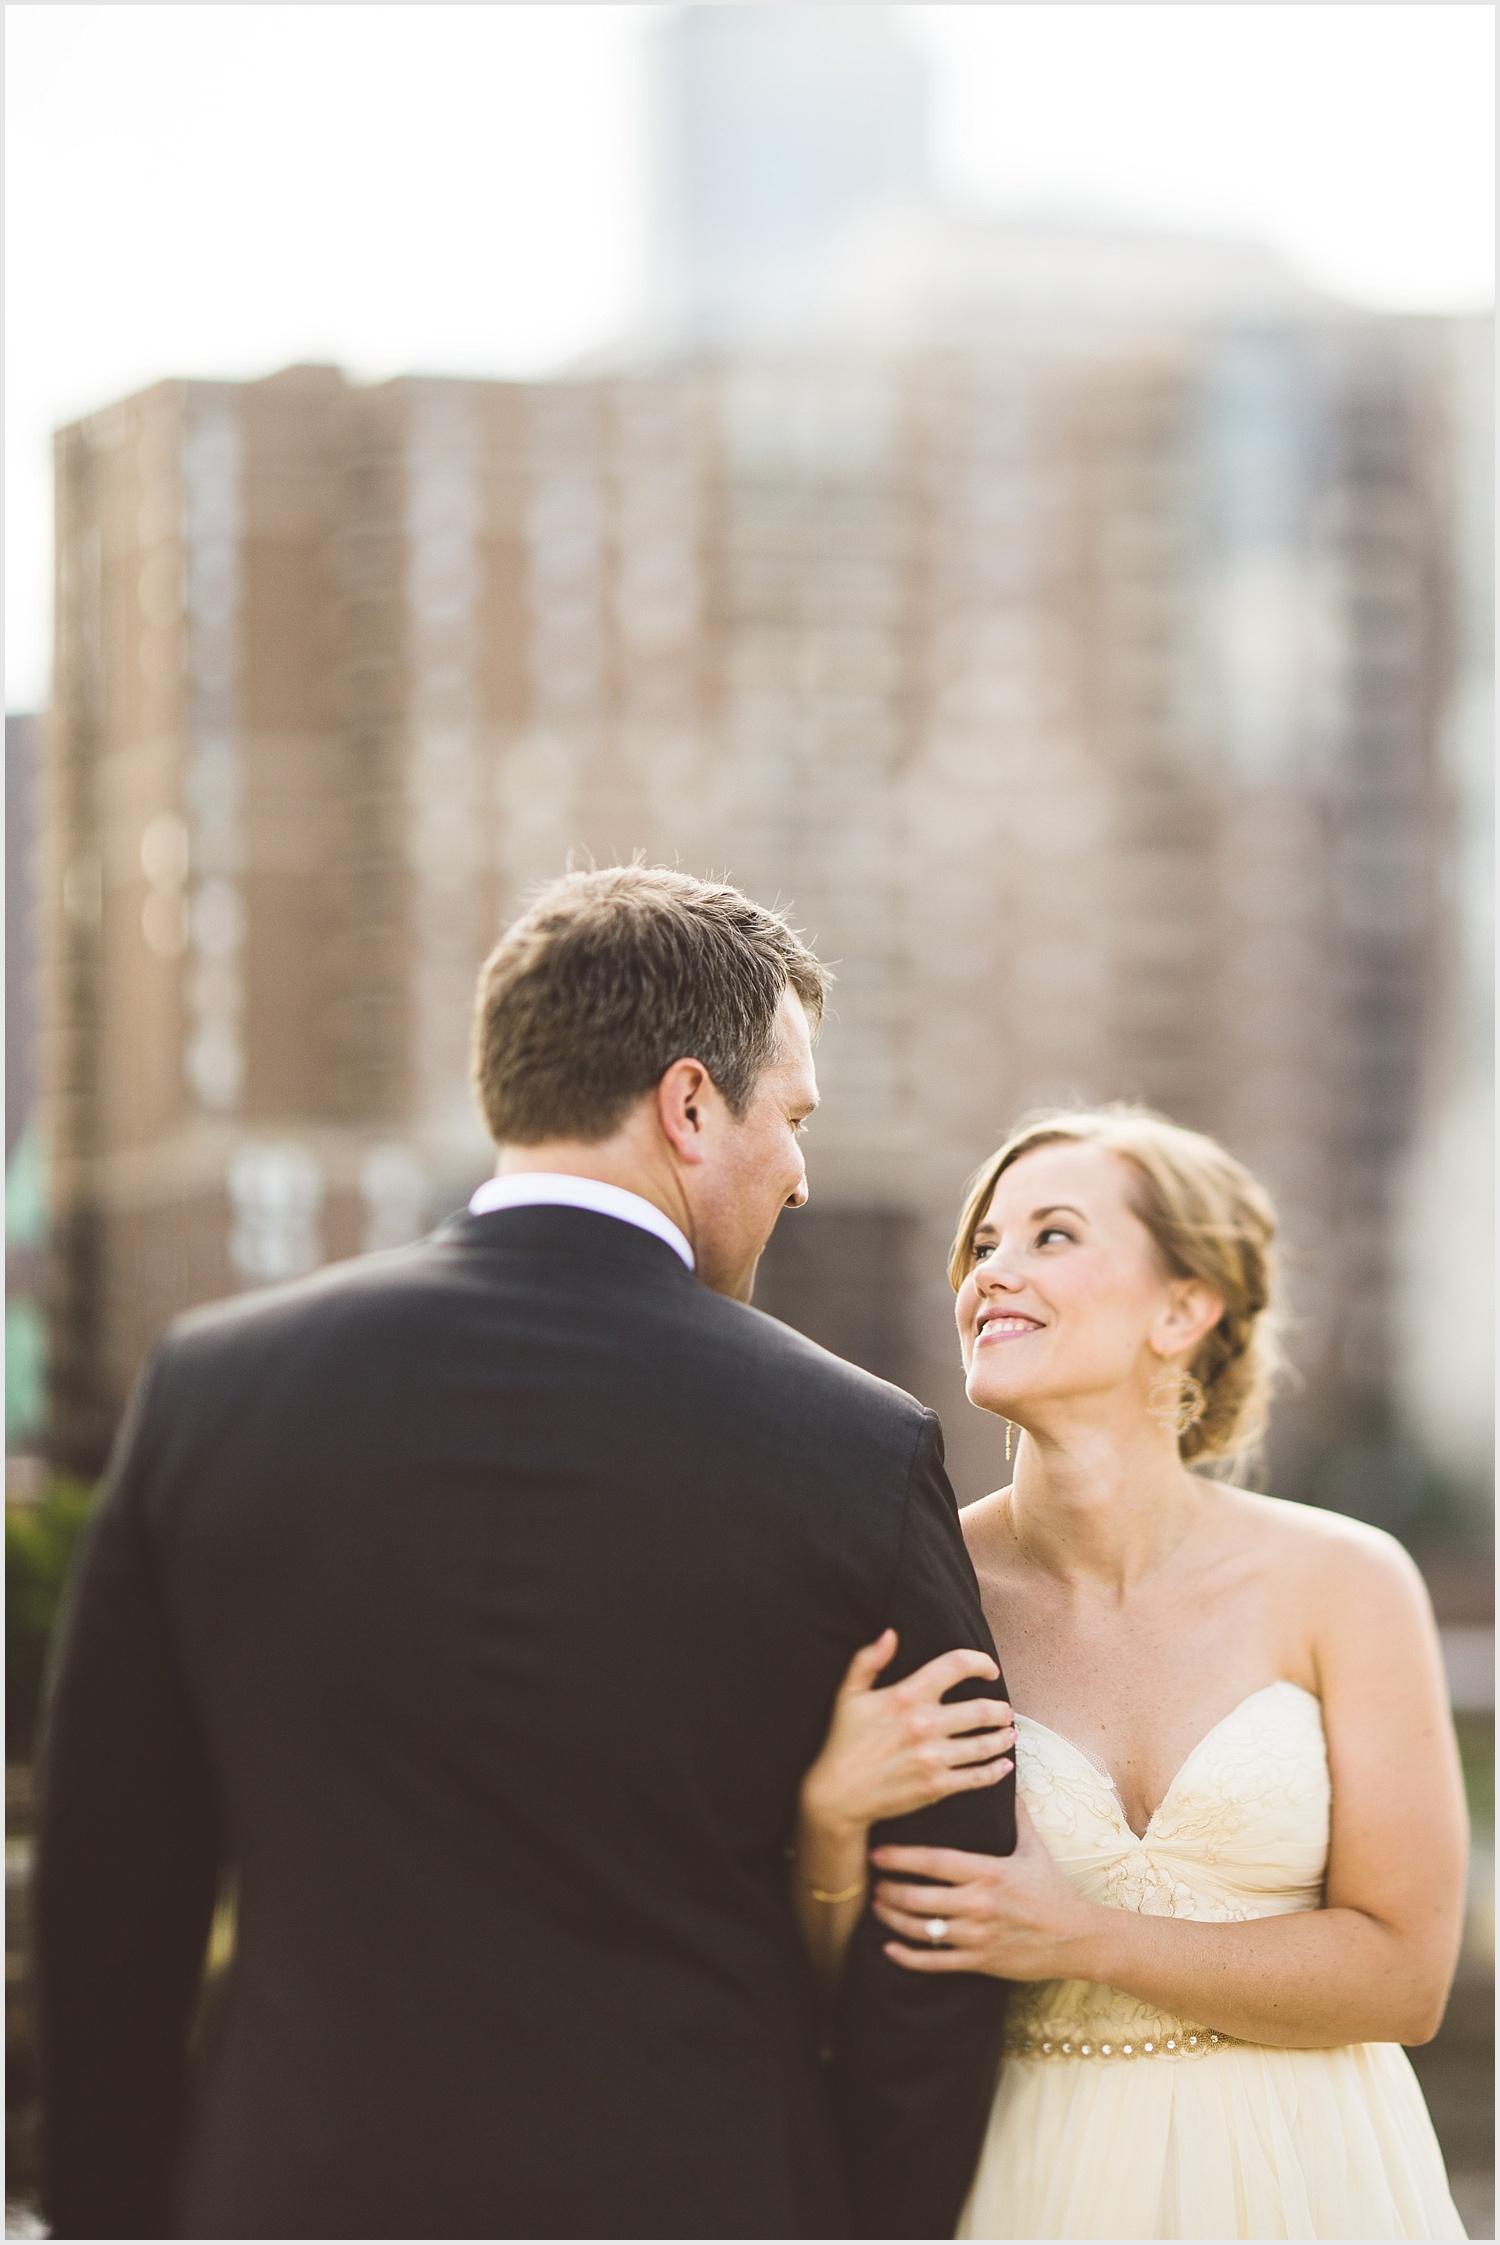 kb_aster_cafe_water_power_park_minneapolis_wedding_photo_minneapolis_by_lucas_botz_photography_16.jpg